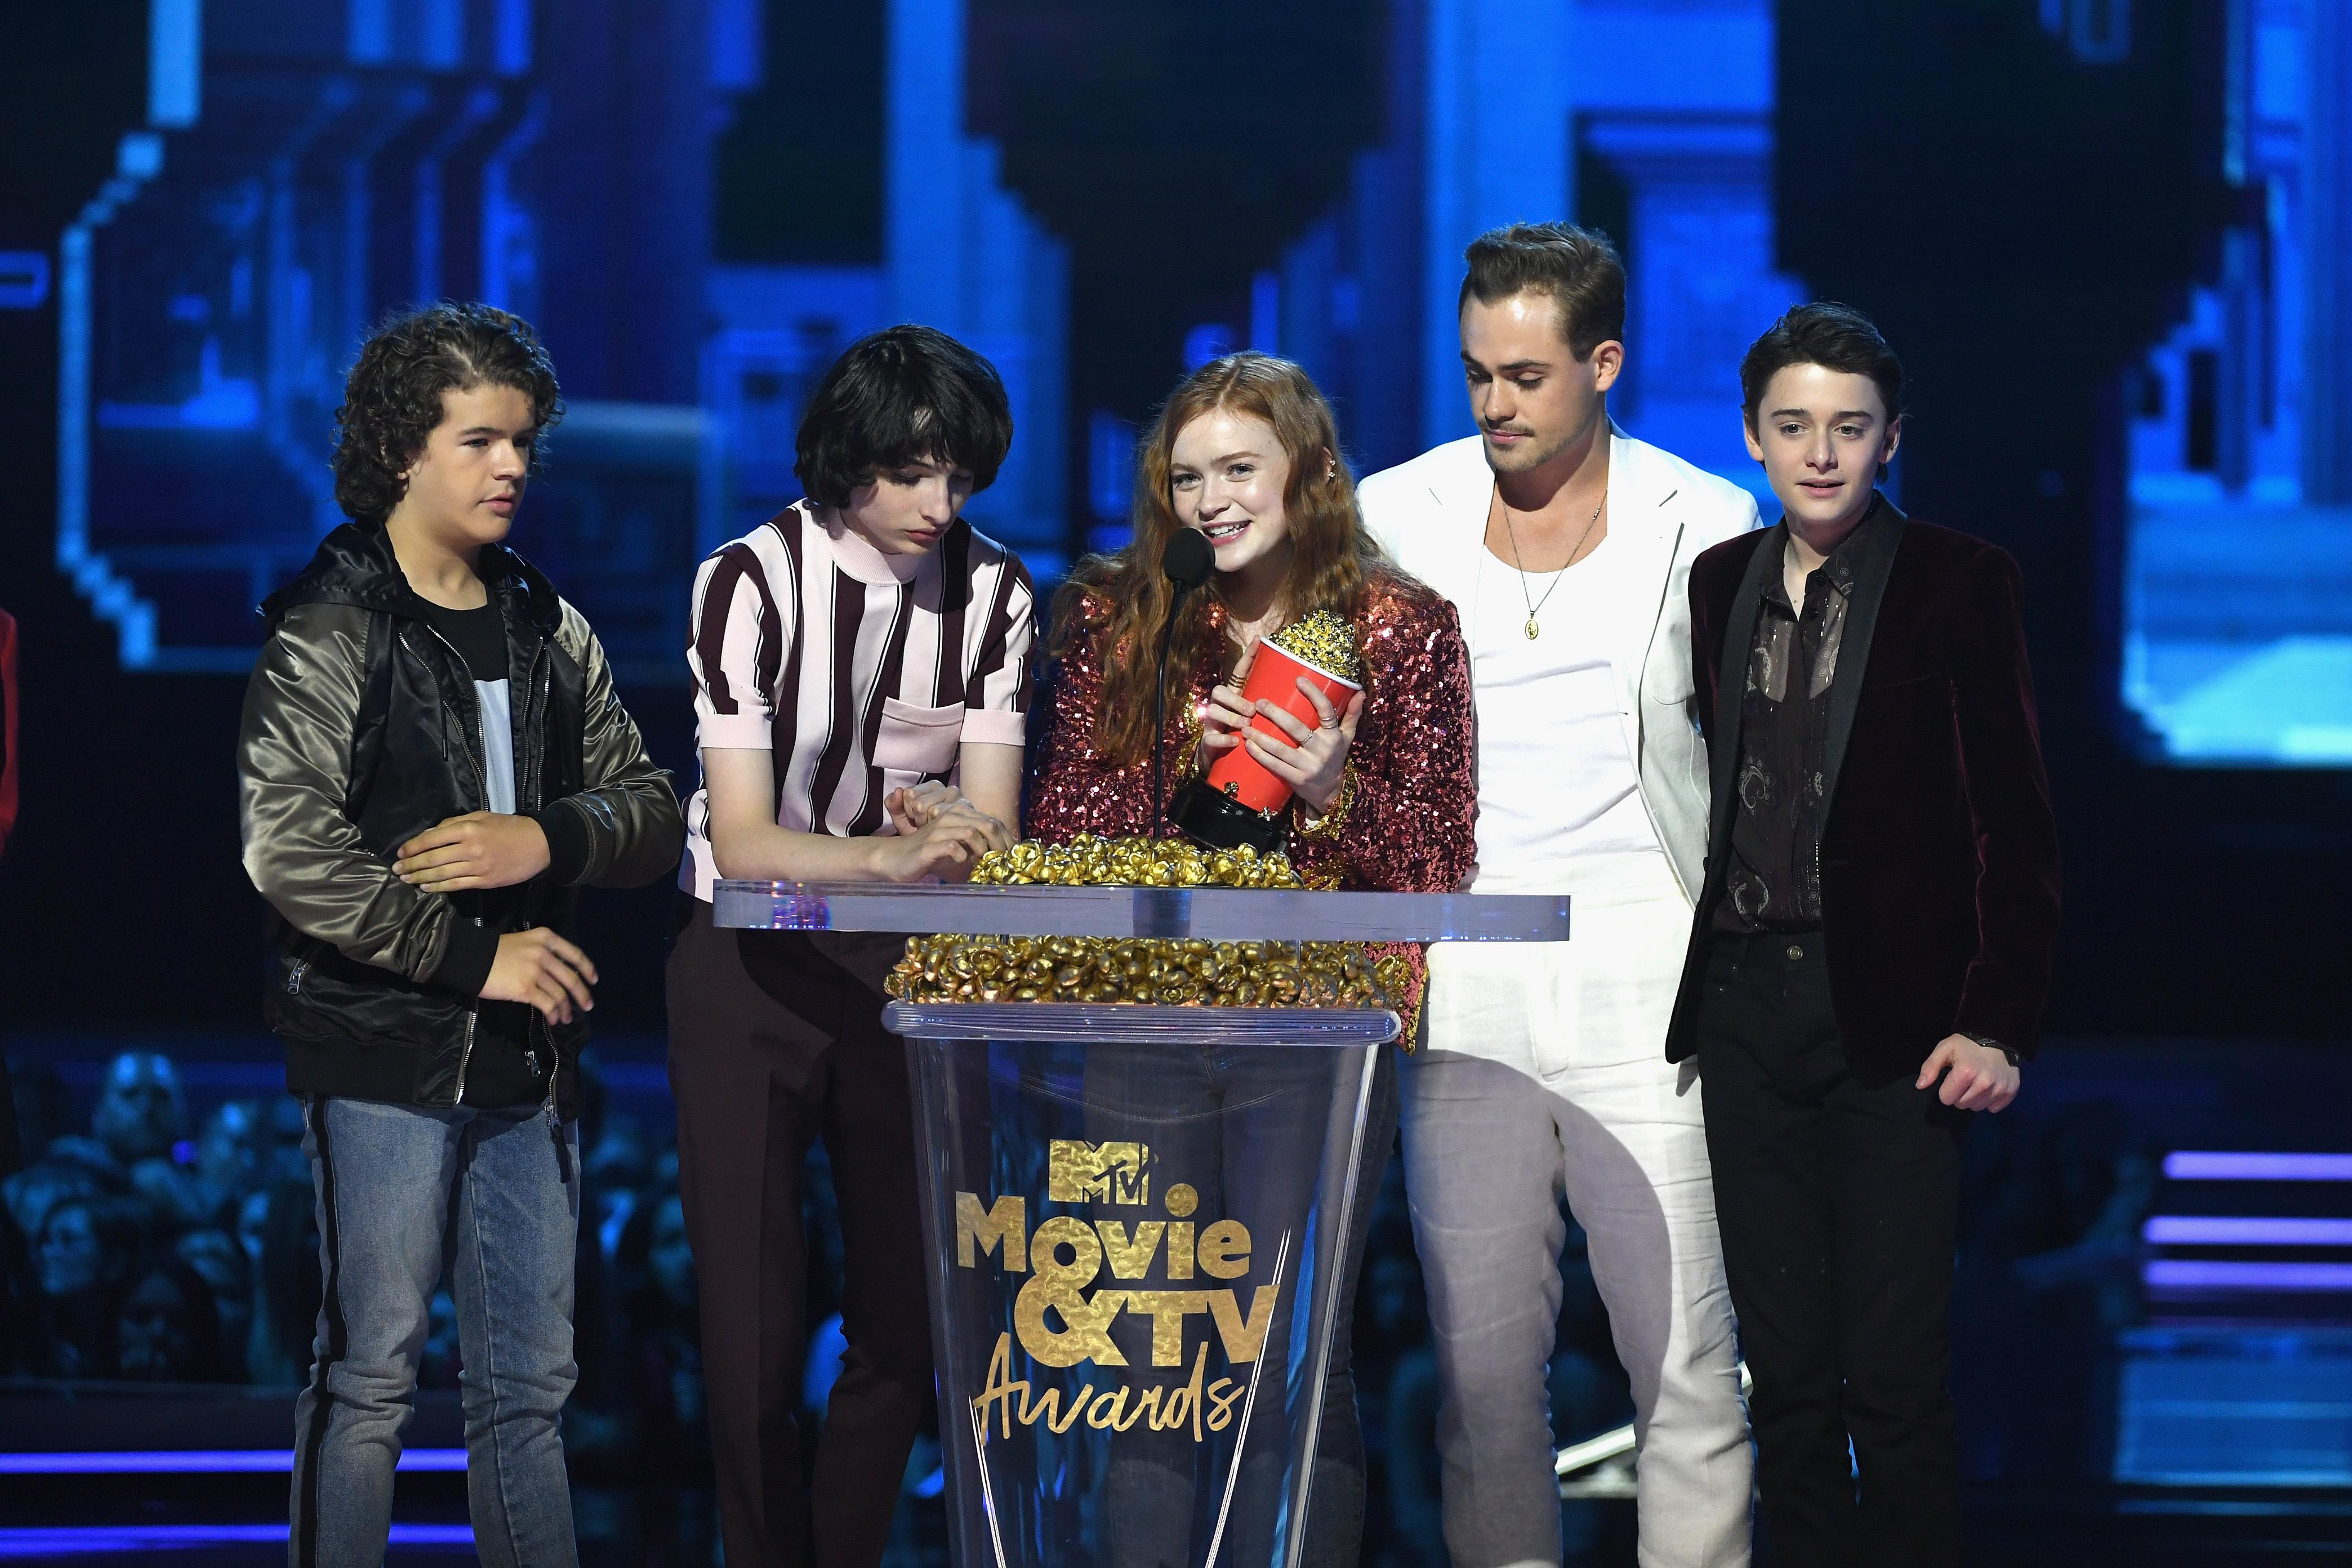 2018 MTV Movie And TV Awards - Gaten Matarazzo, Finn Wolfhard, Sadie Sink, Dacre Montgomery, e Noah Schnapp representando Stranger Things como 'Melhor Série'